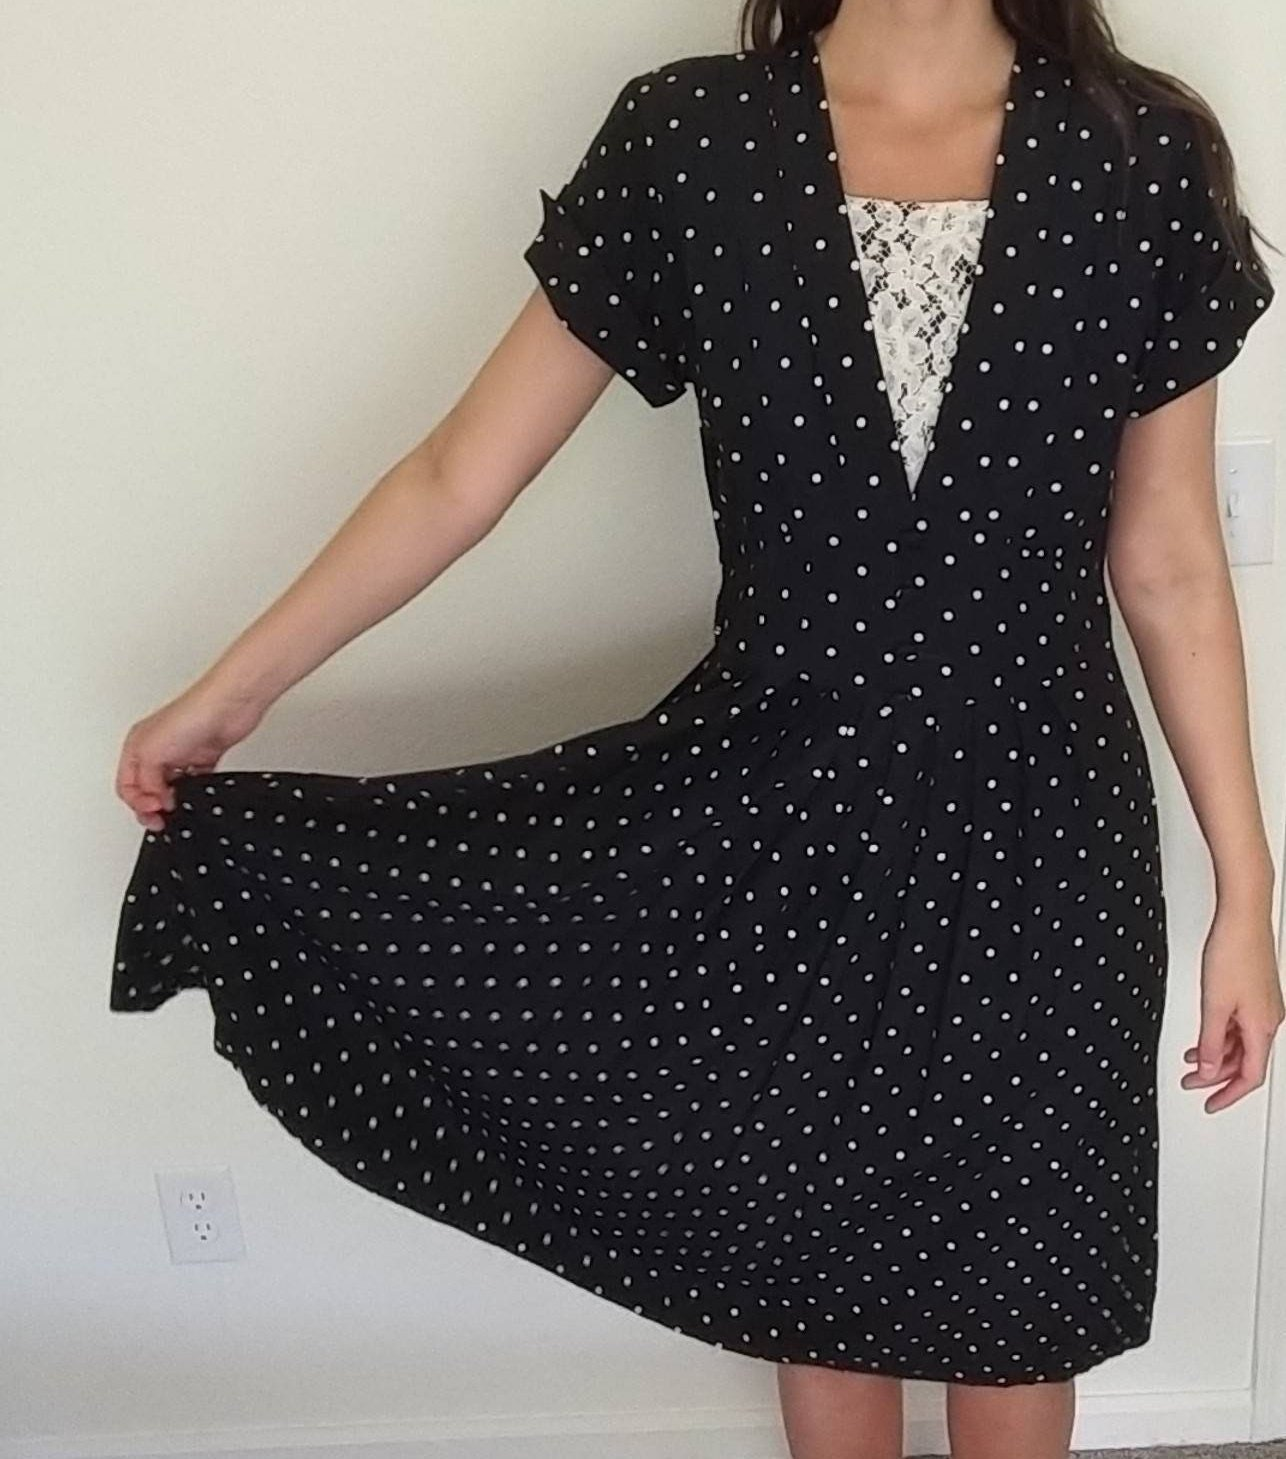 becb236f7cf7 Vintage Black And White Polka Dot Dress